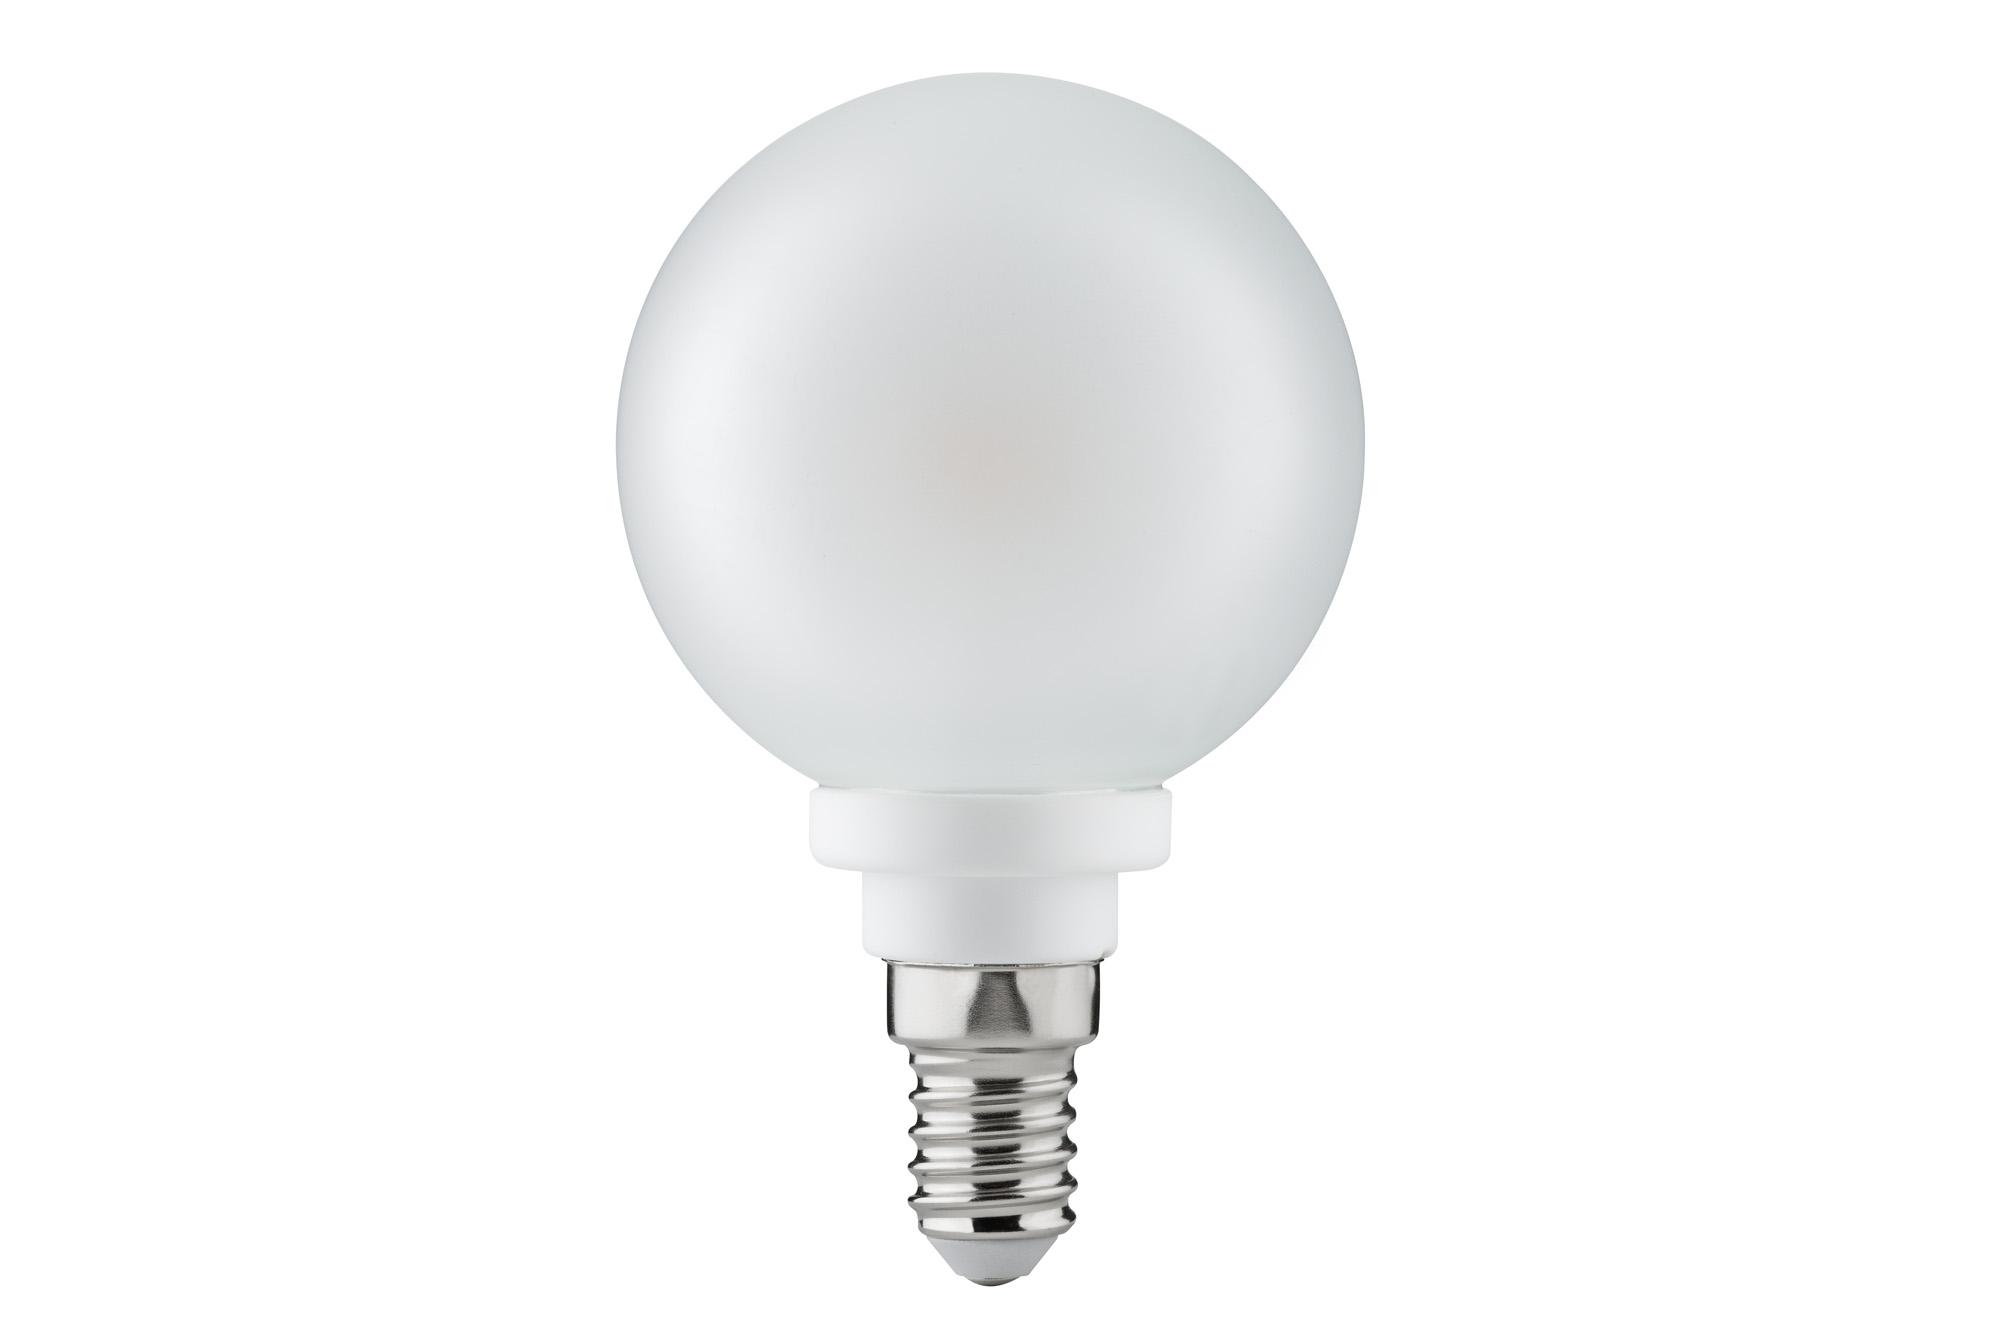 LED Globelampe 60mm 4 Watt E14 Warmweiß Satin-28324